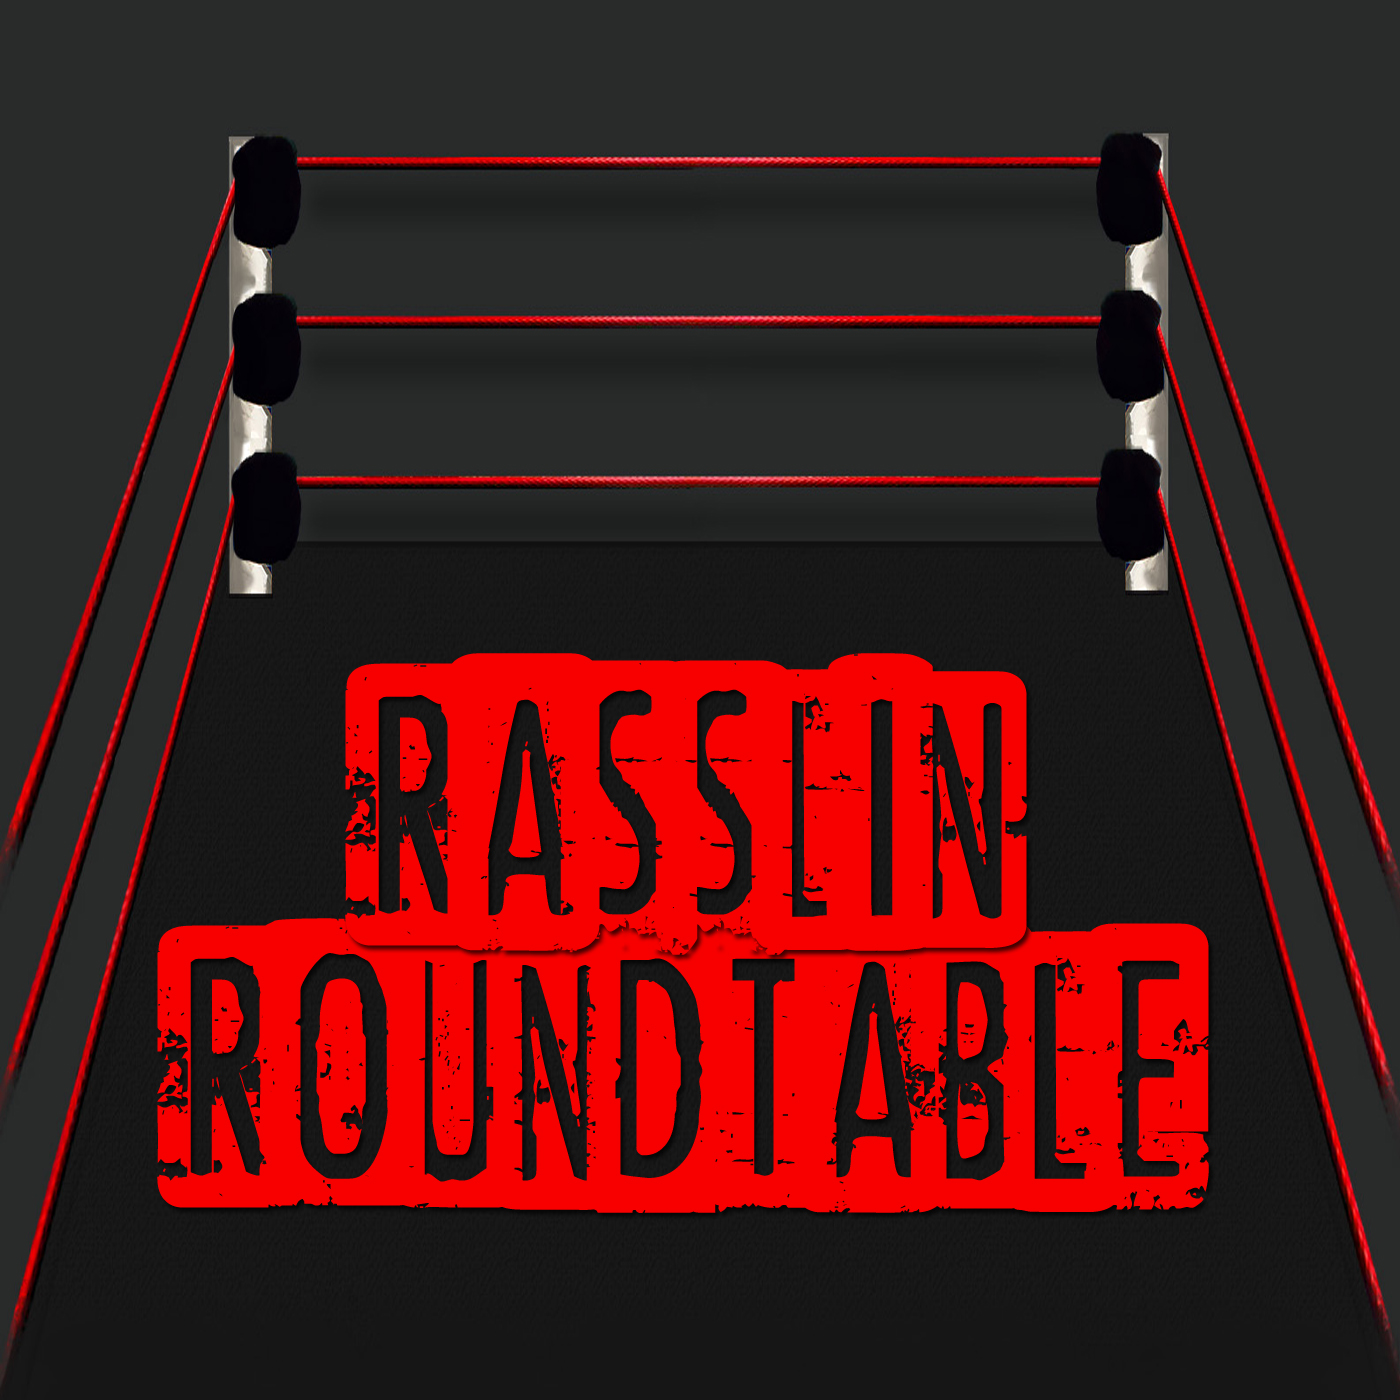 Rasslin RoundTable copy.jpg